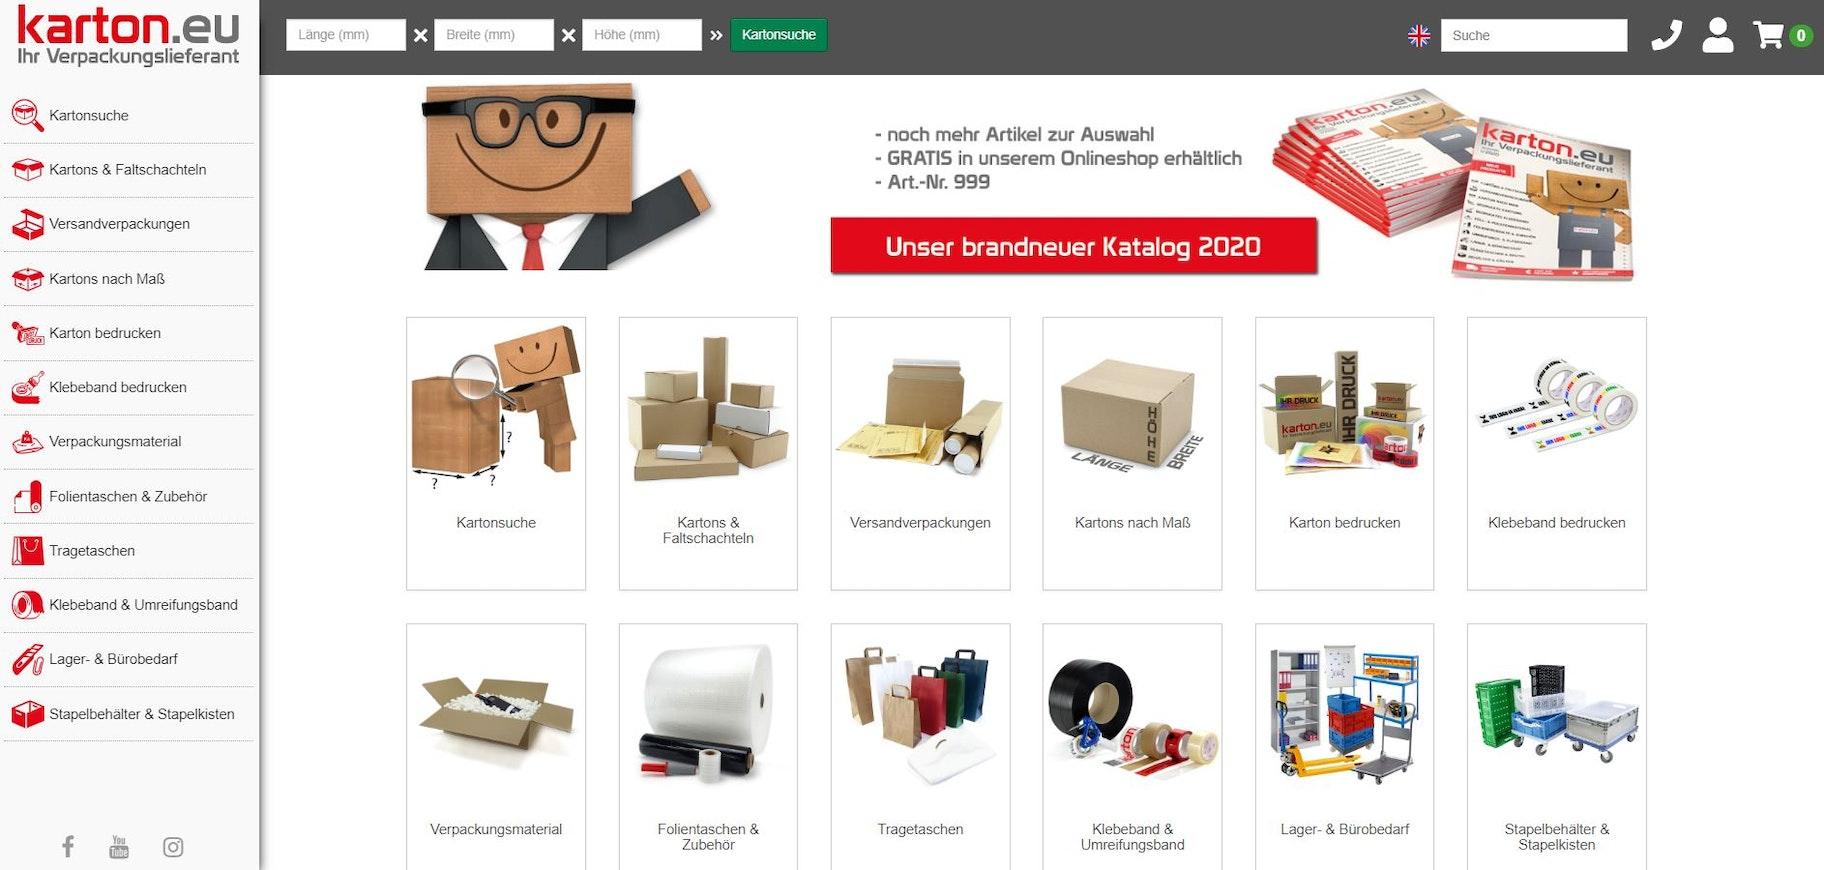 Verpackung bei Karton.eu